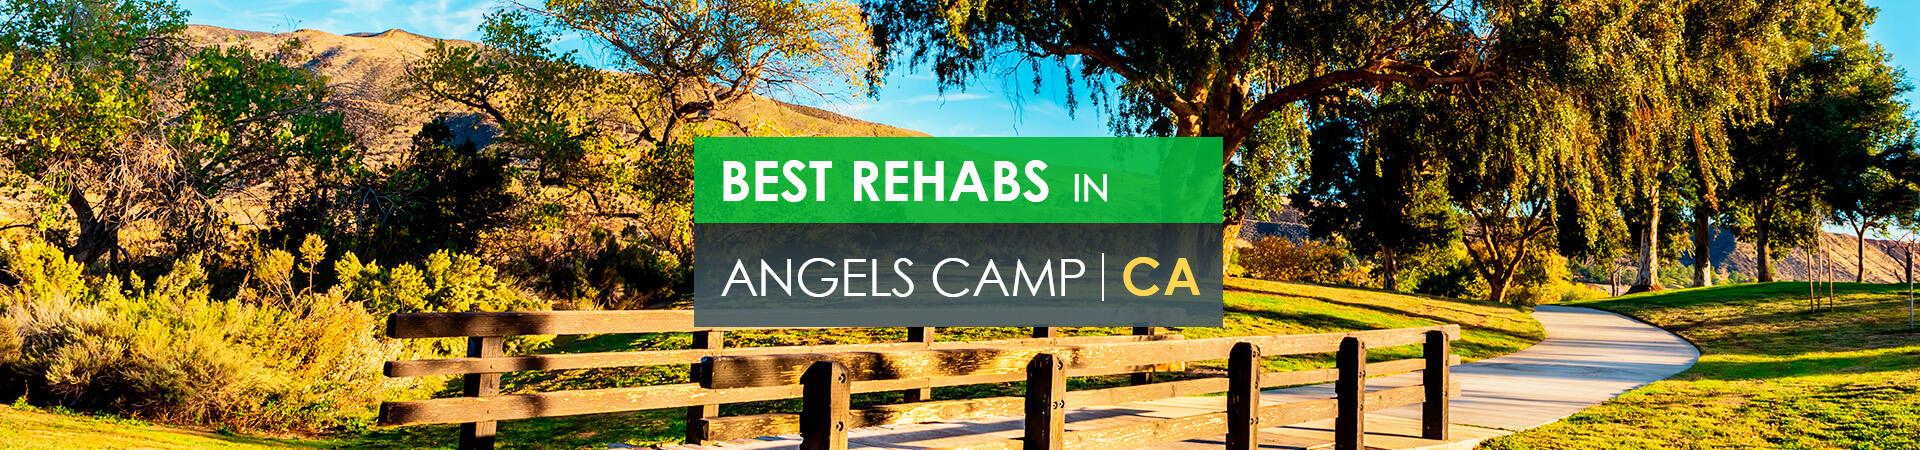 Best rehabs in Angels Camp, CA